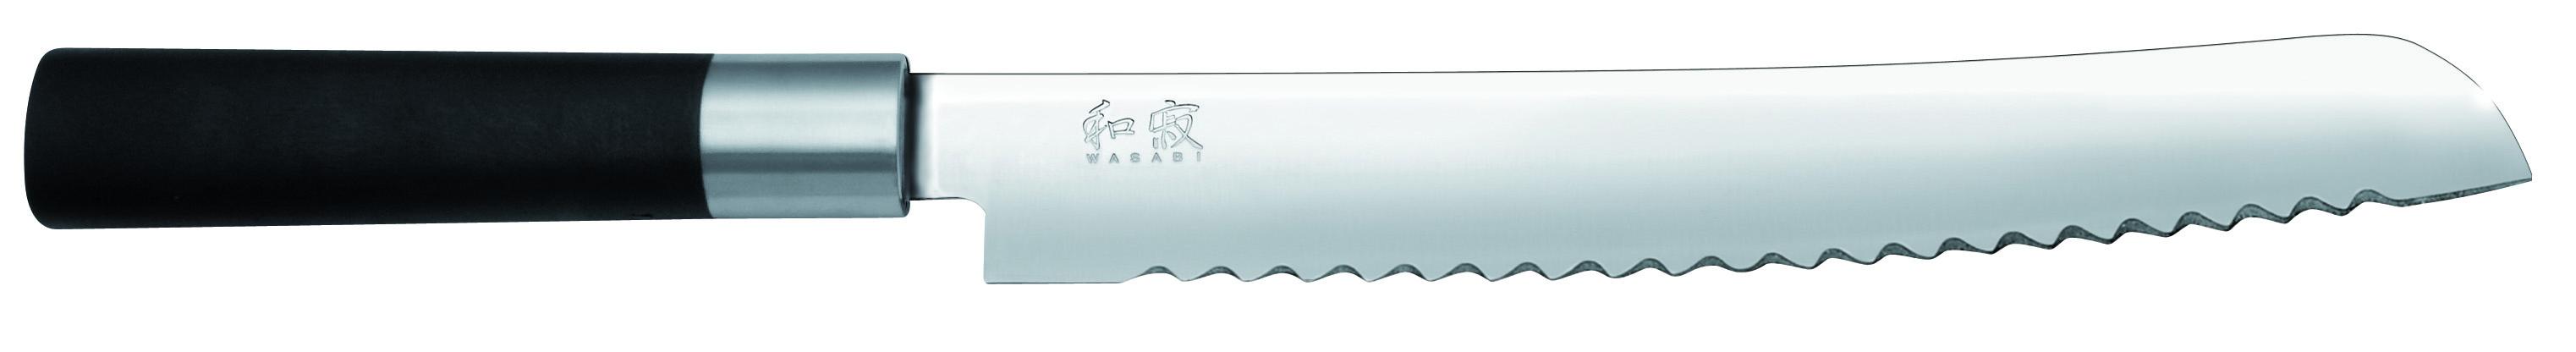 Nôž na chlieb Wasabi Black 6723B